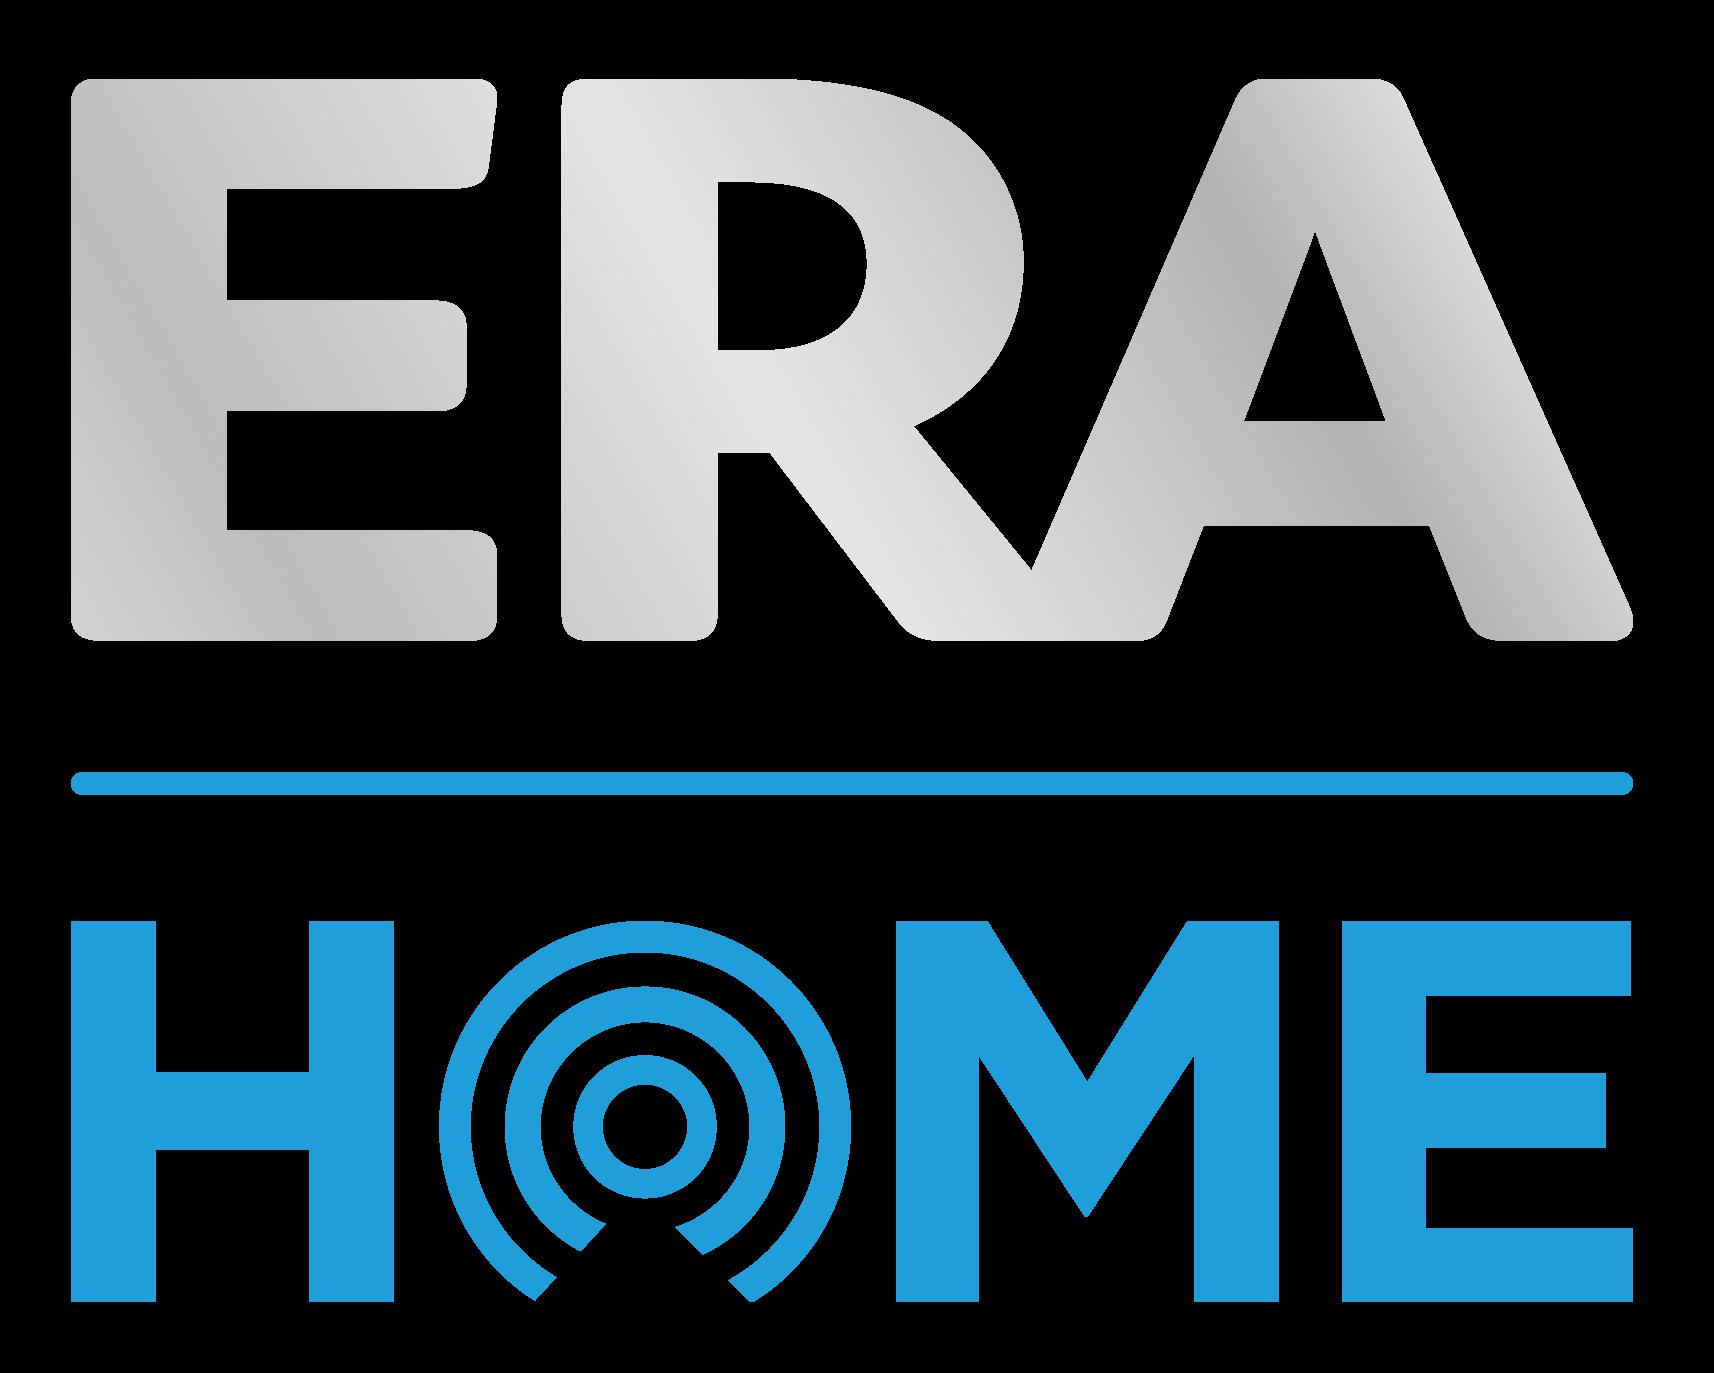 Homecam WiFI Security System | Smart Home Security Camera, UK